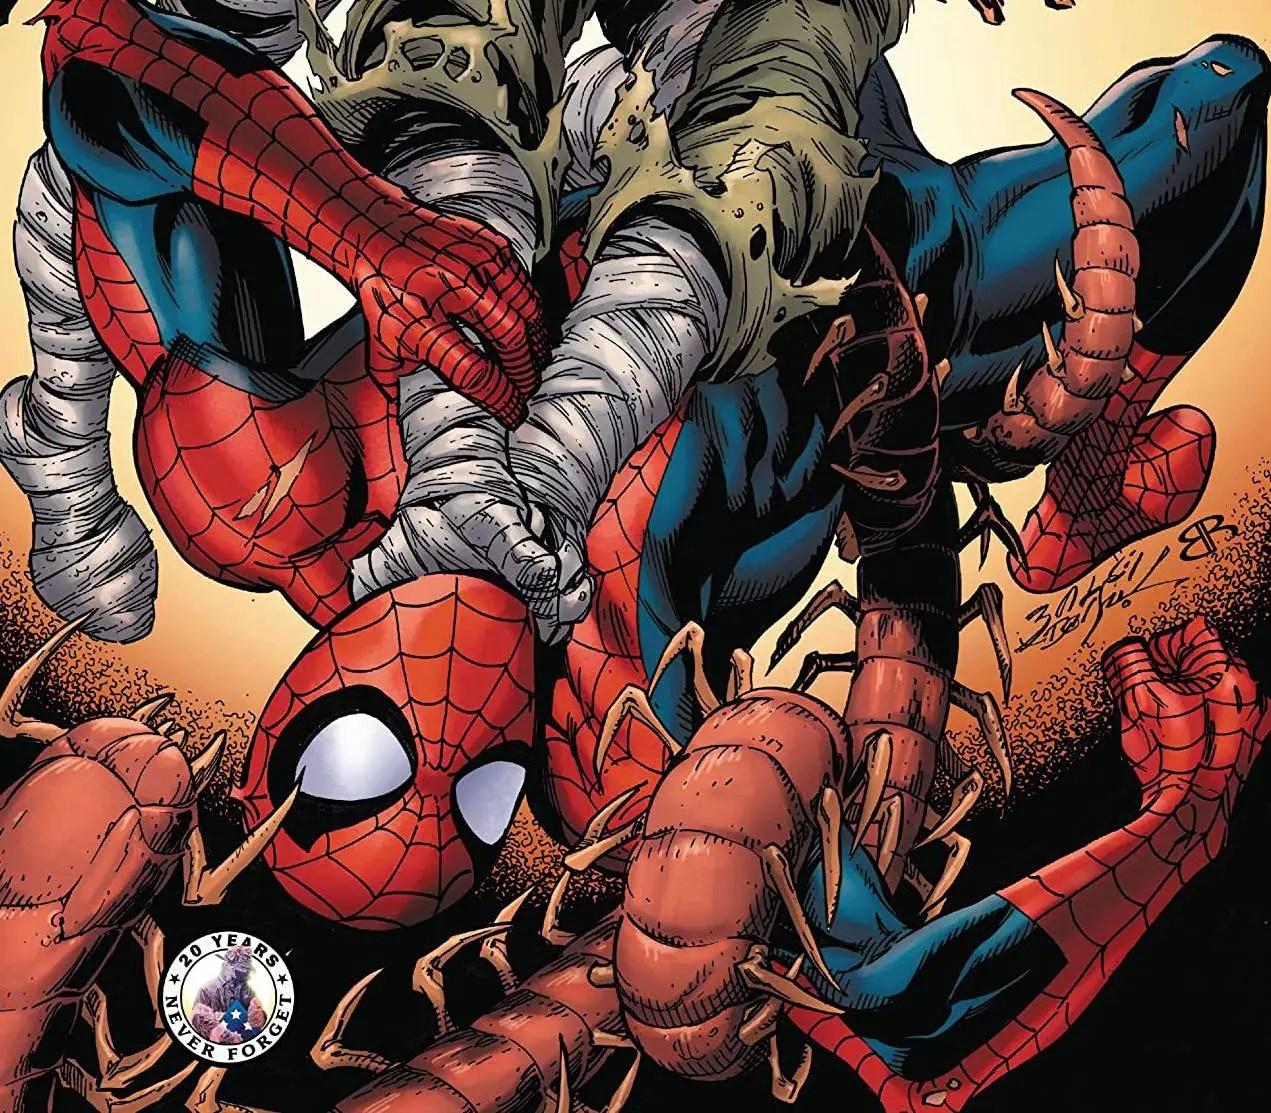 'Amazing Spider-Man' #73 is like Green Goblin character rehabilitation